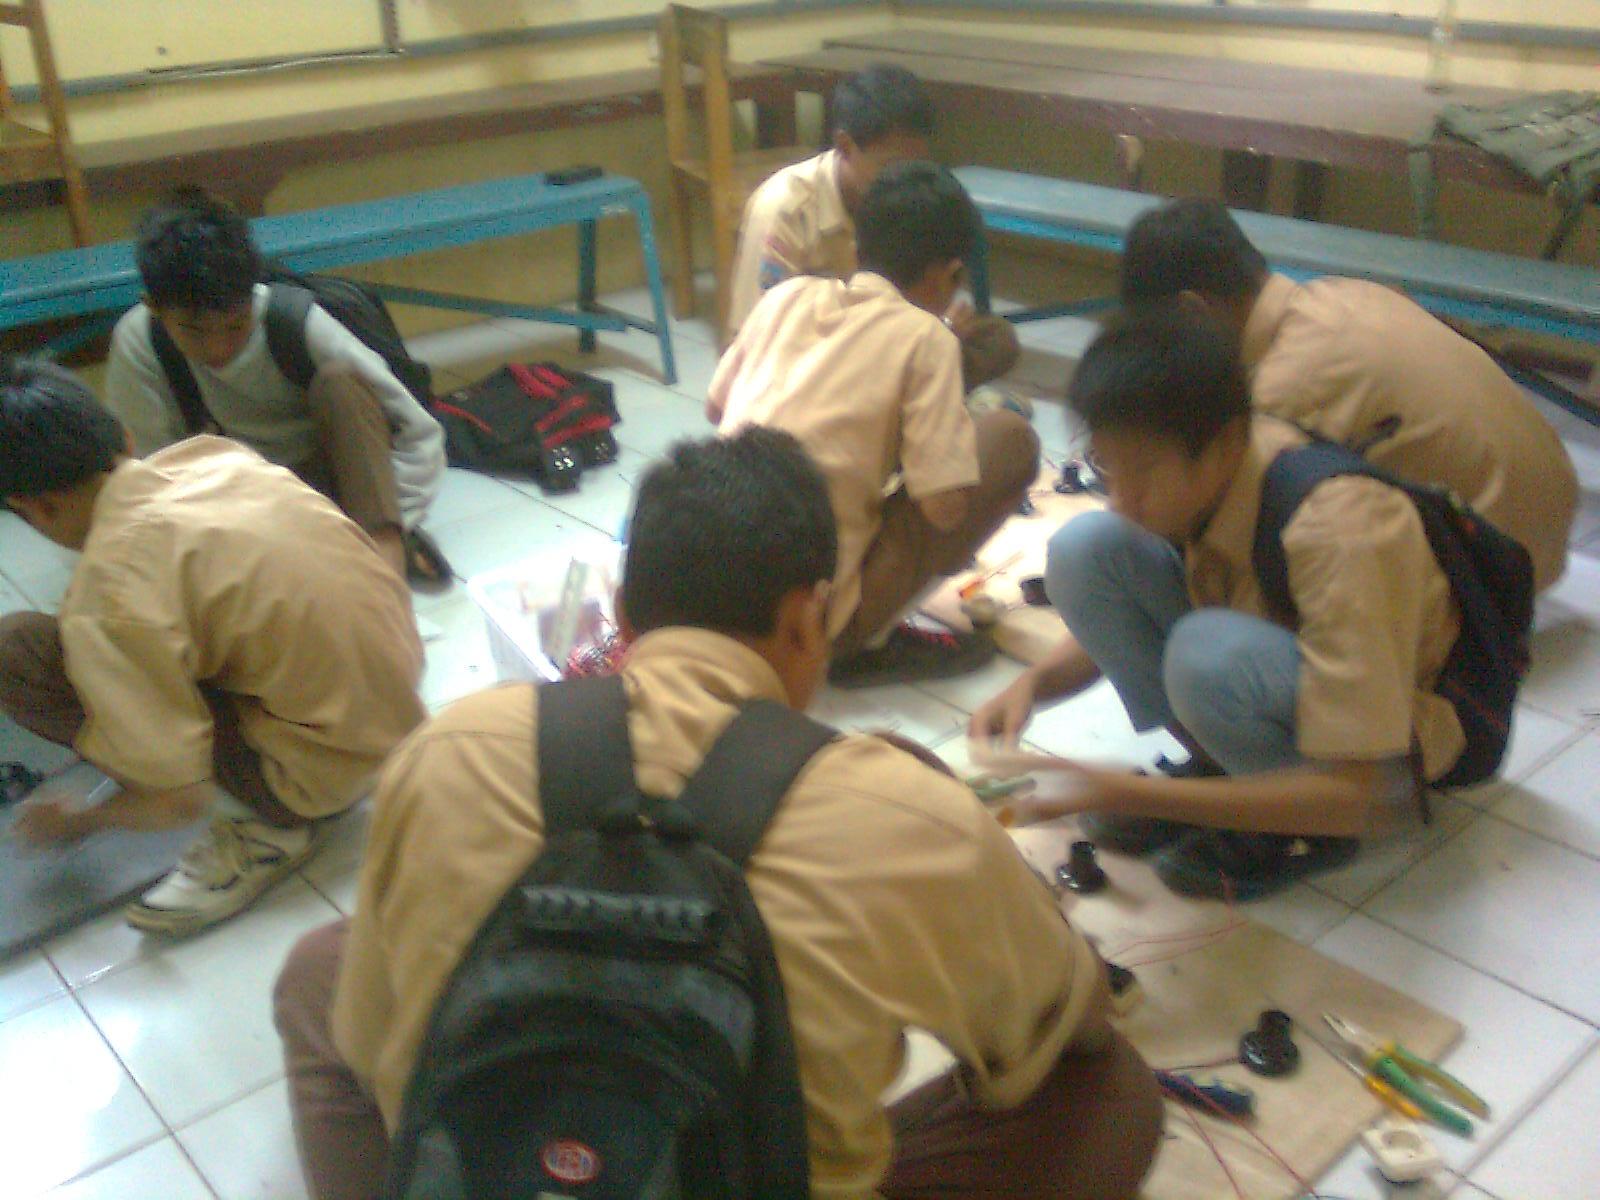 Praktek Instalasi Listrik Dasar 171 Smk Negeri 1 Cikande